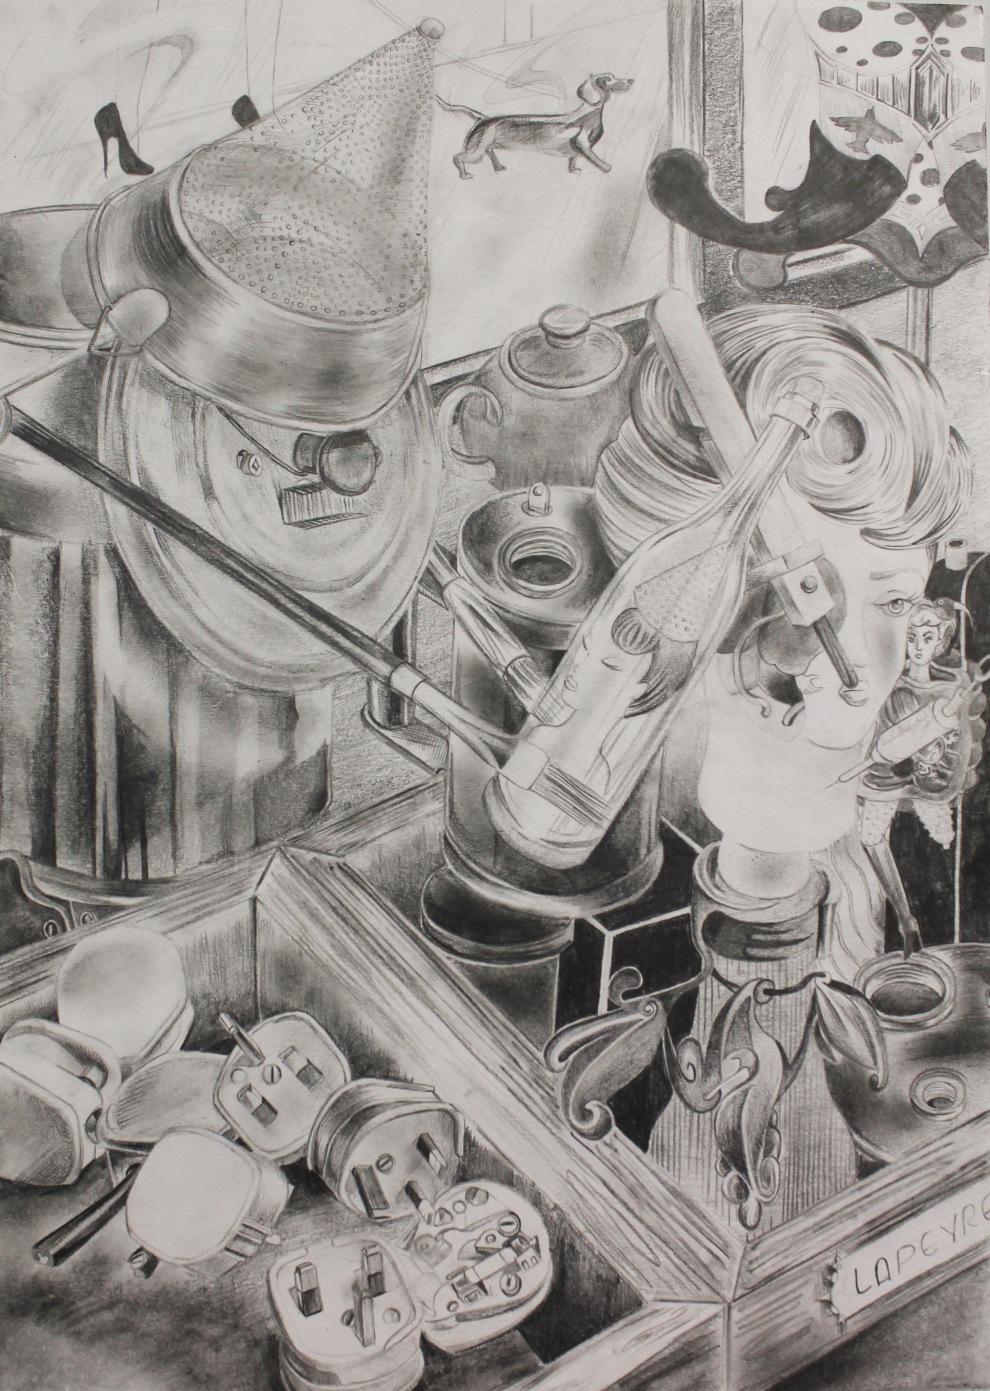 graphite on A3 paper